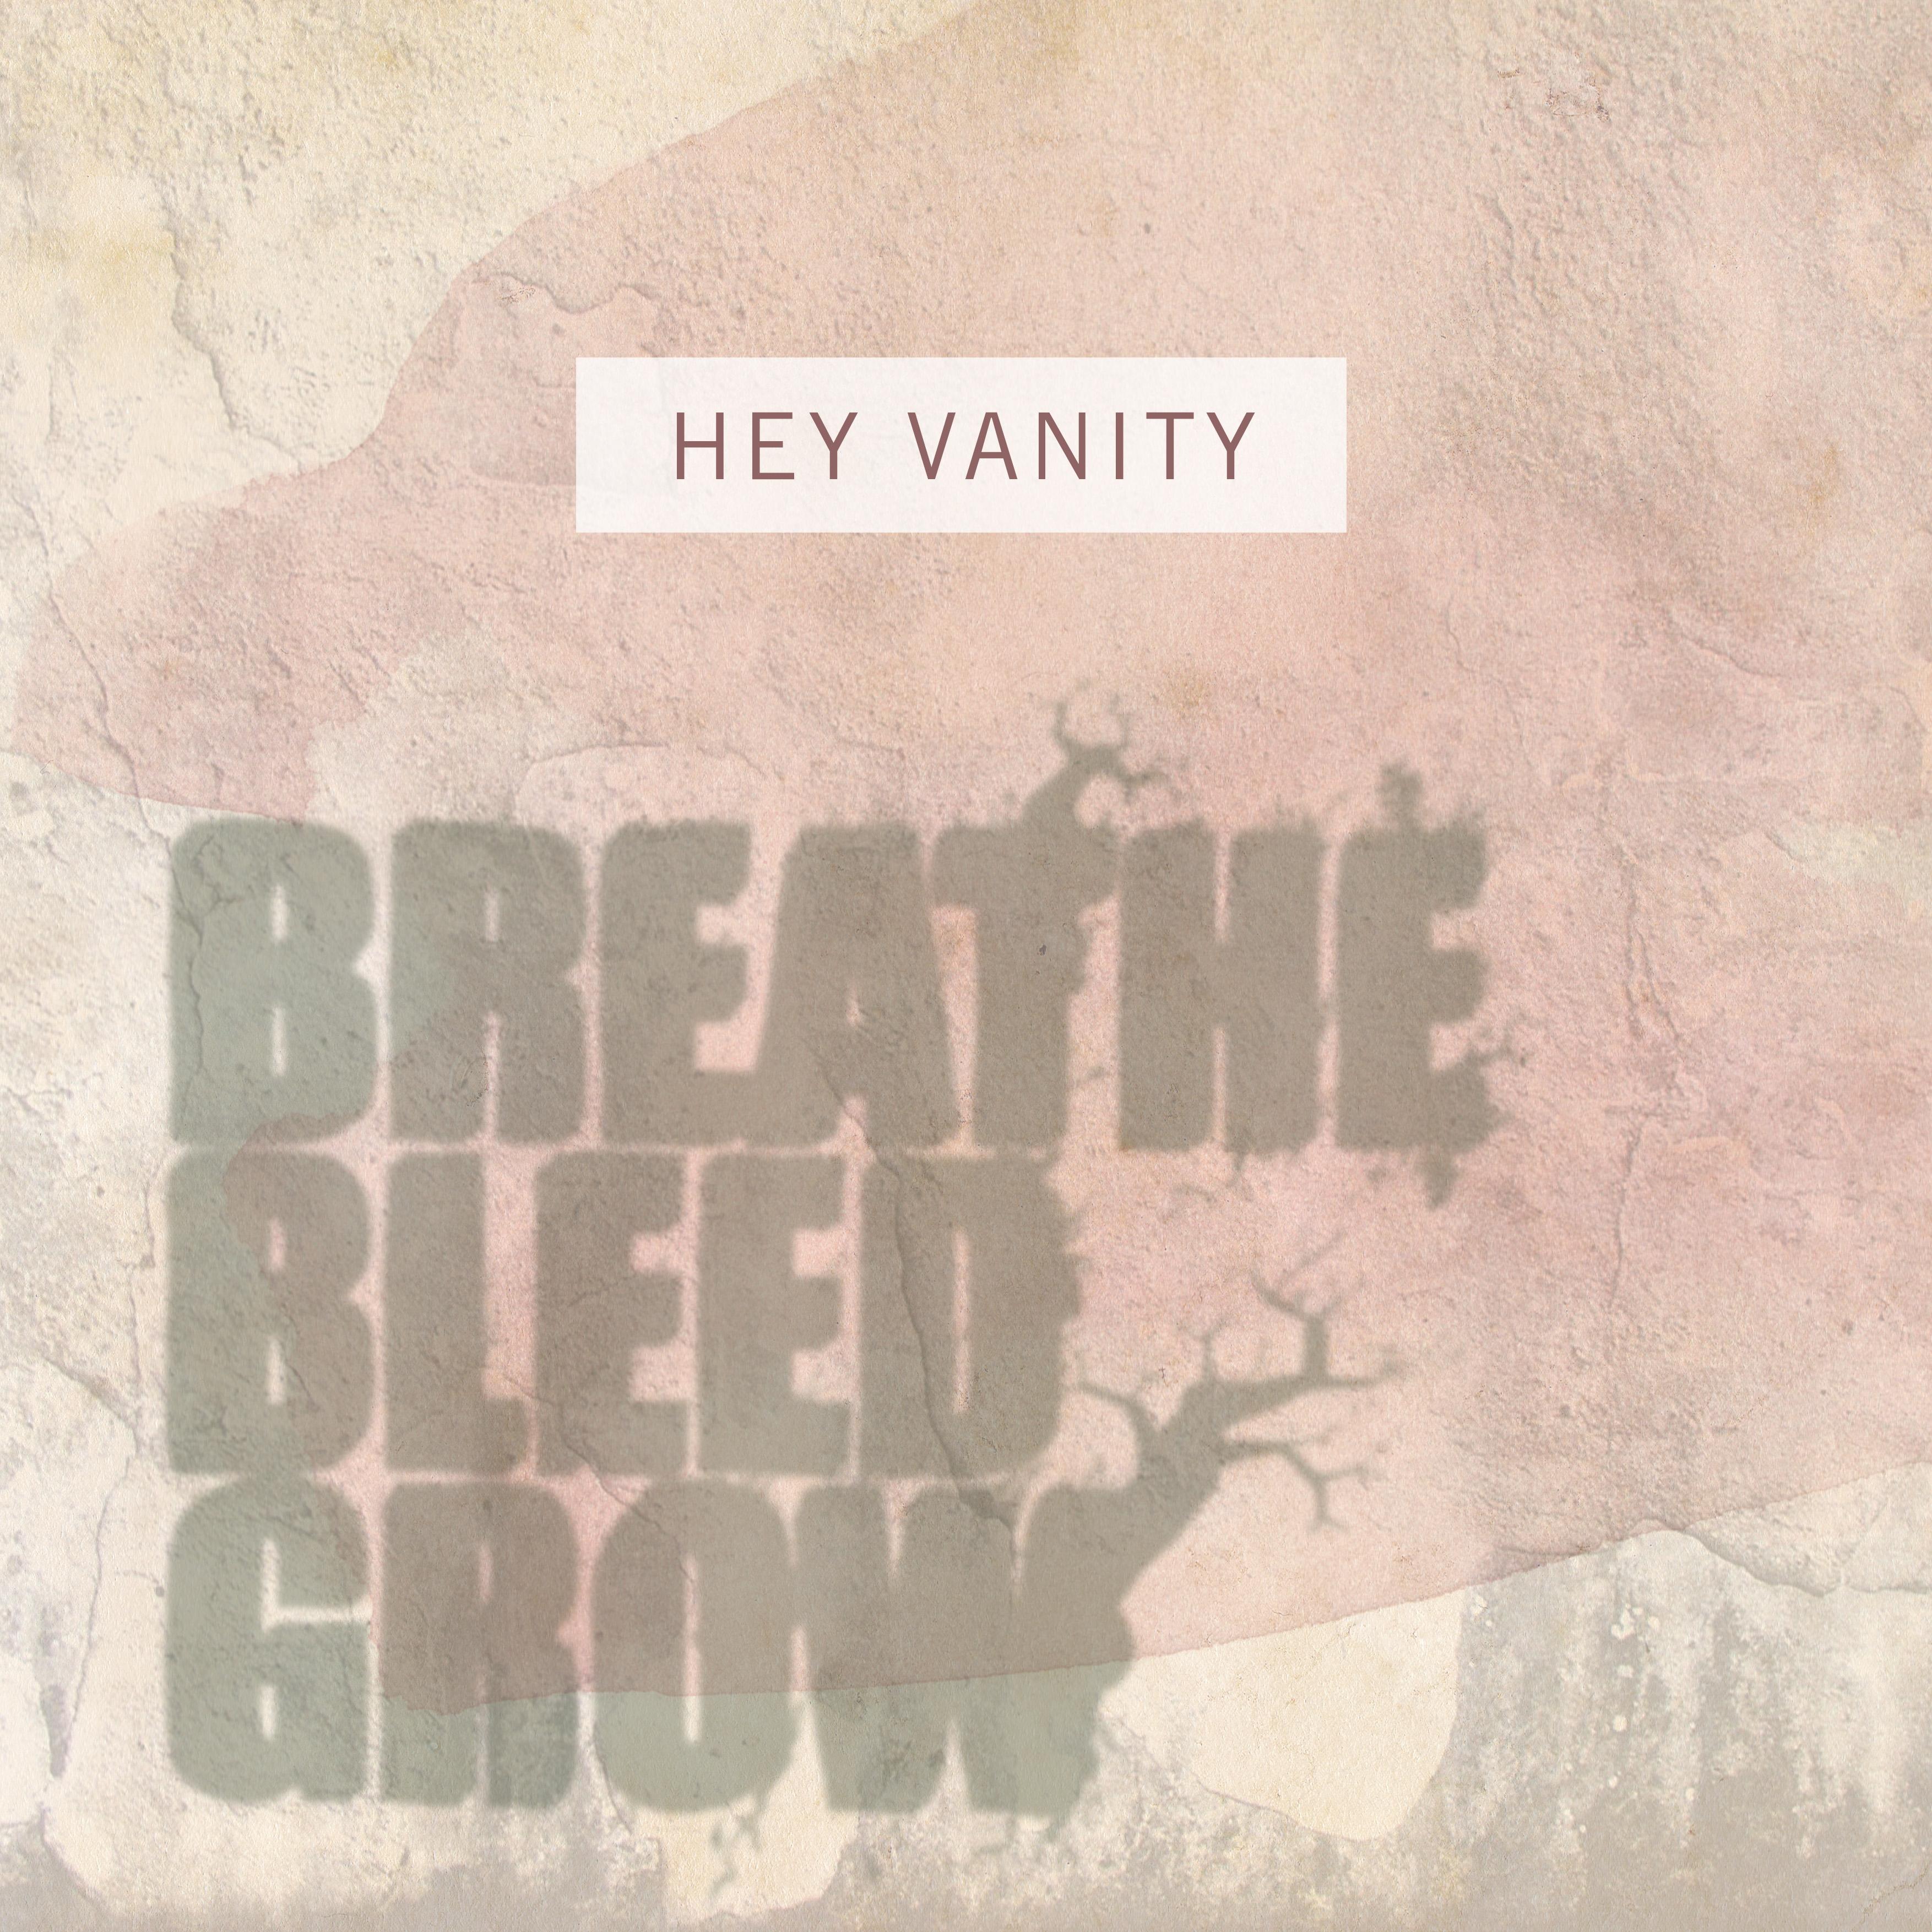 breathe_bleed_grow_Final